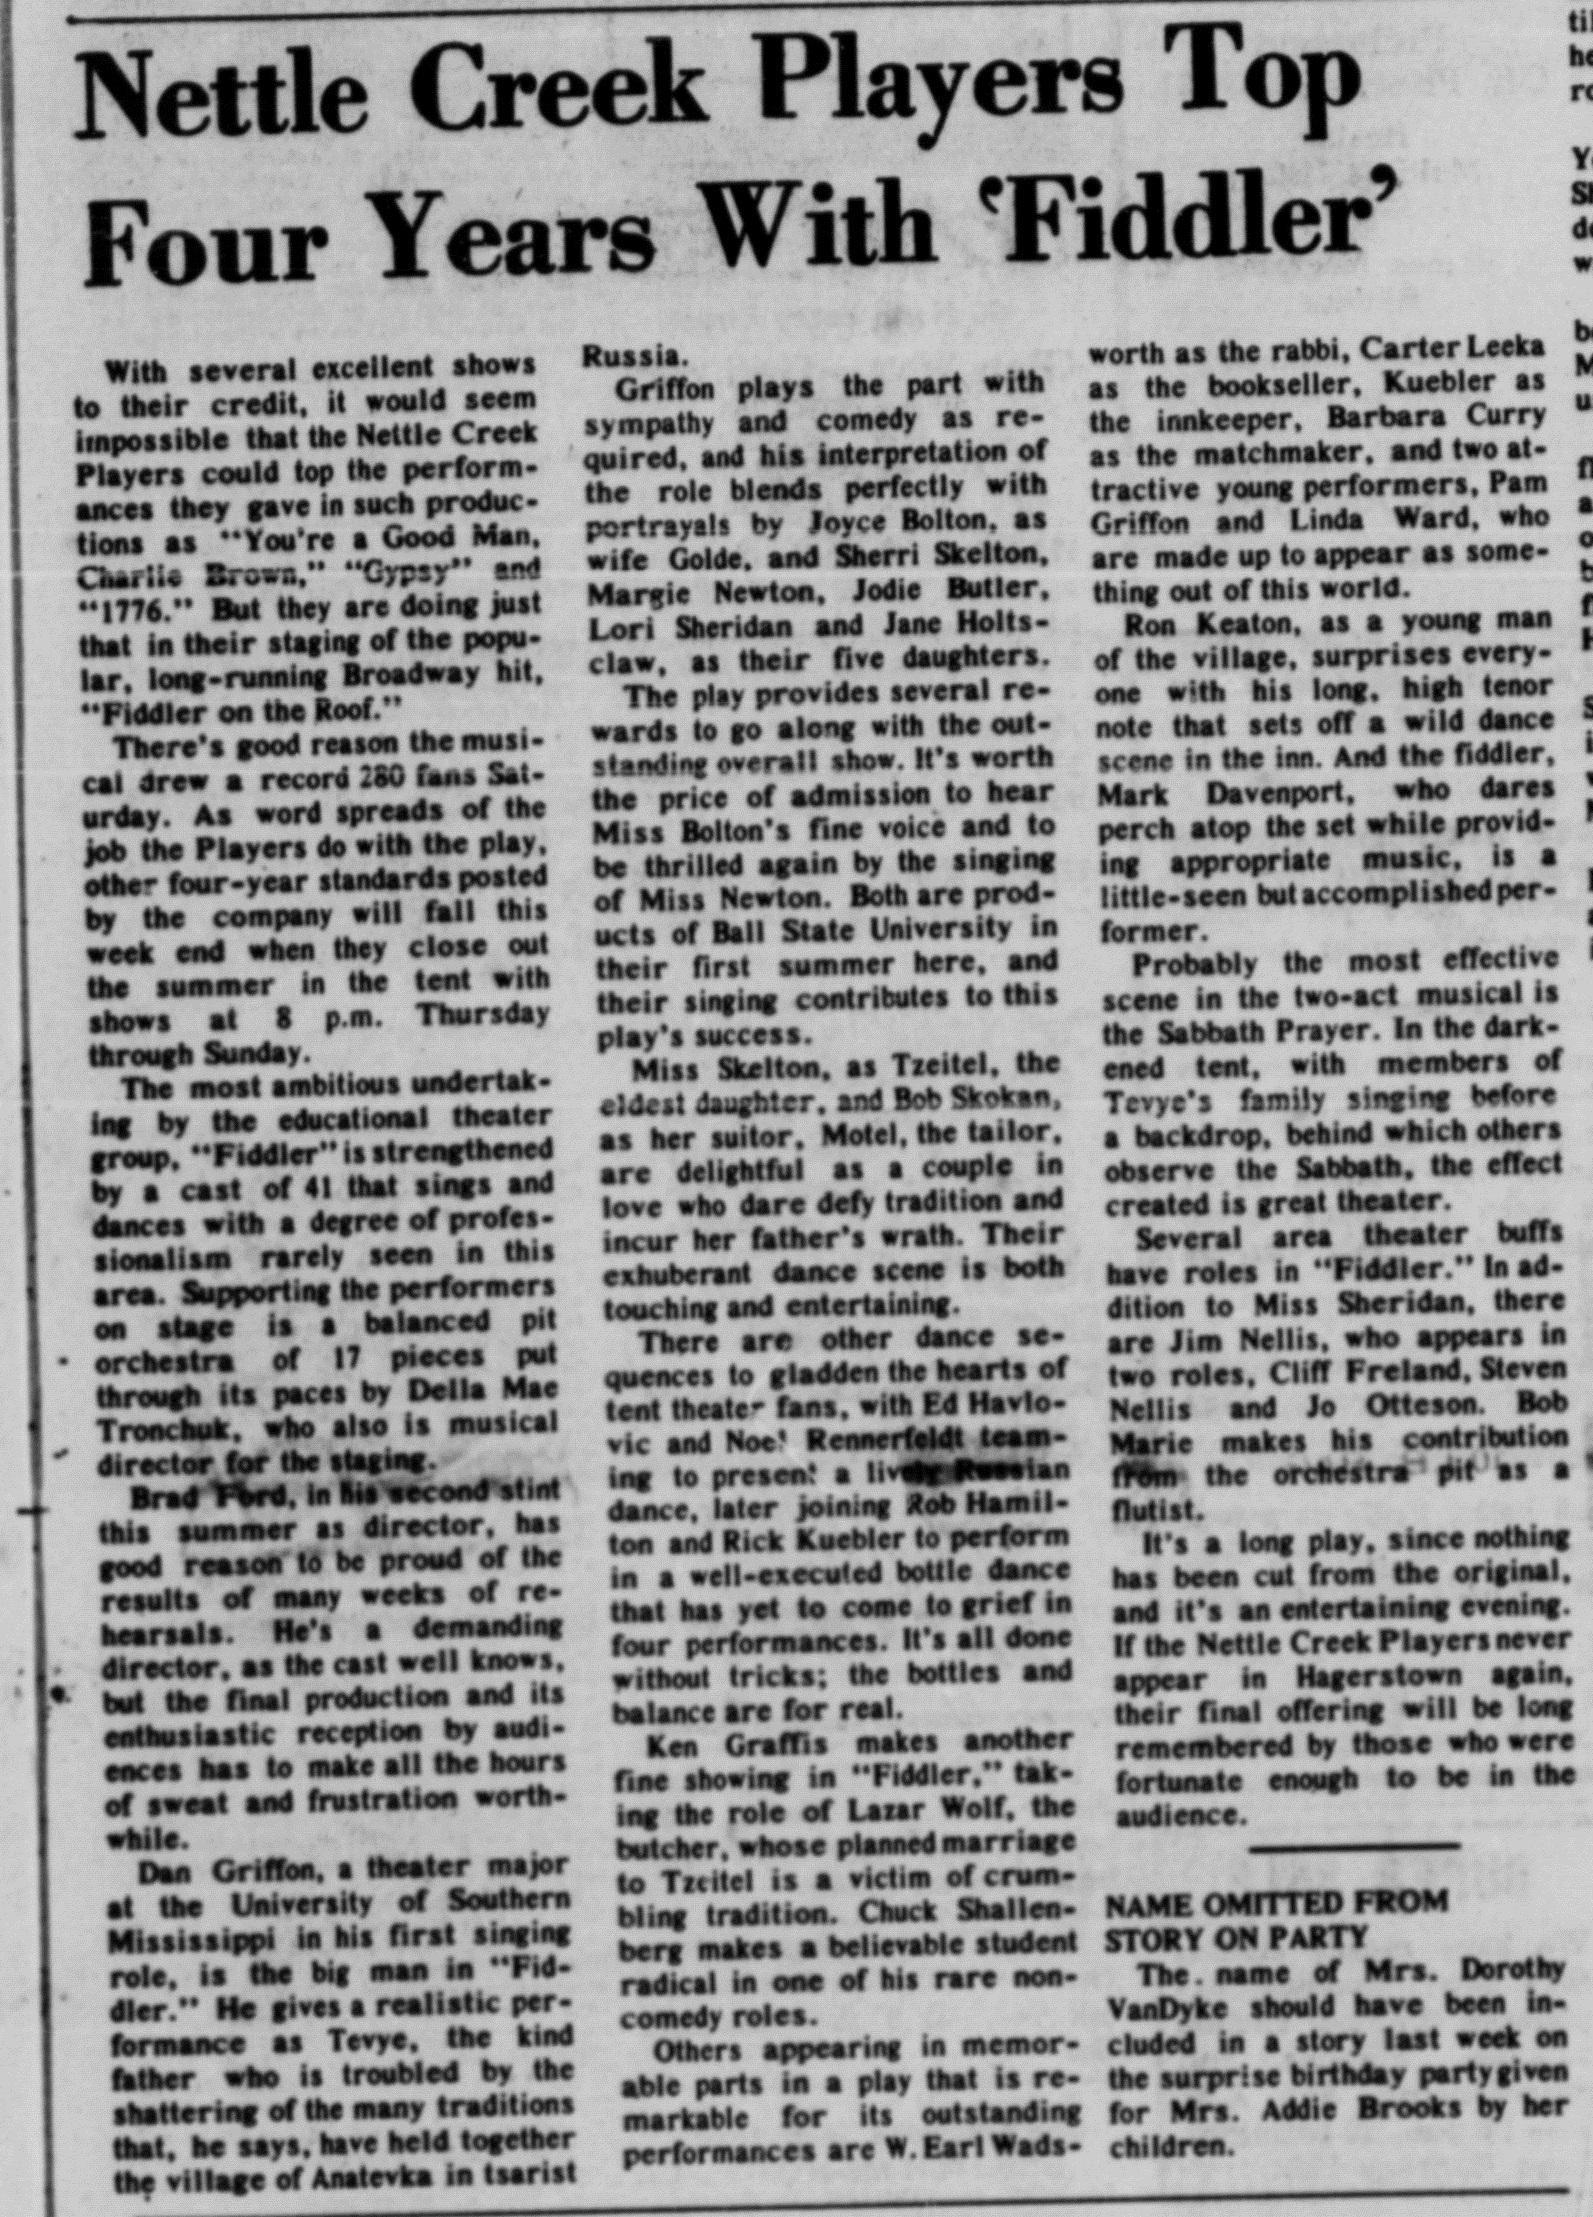 August 1974 Fiddler Review